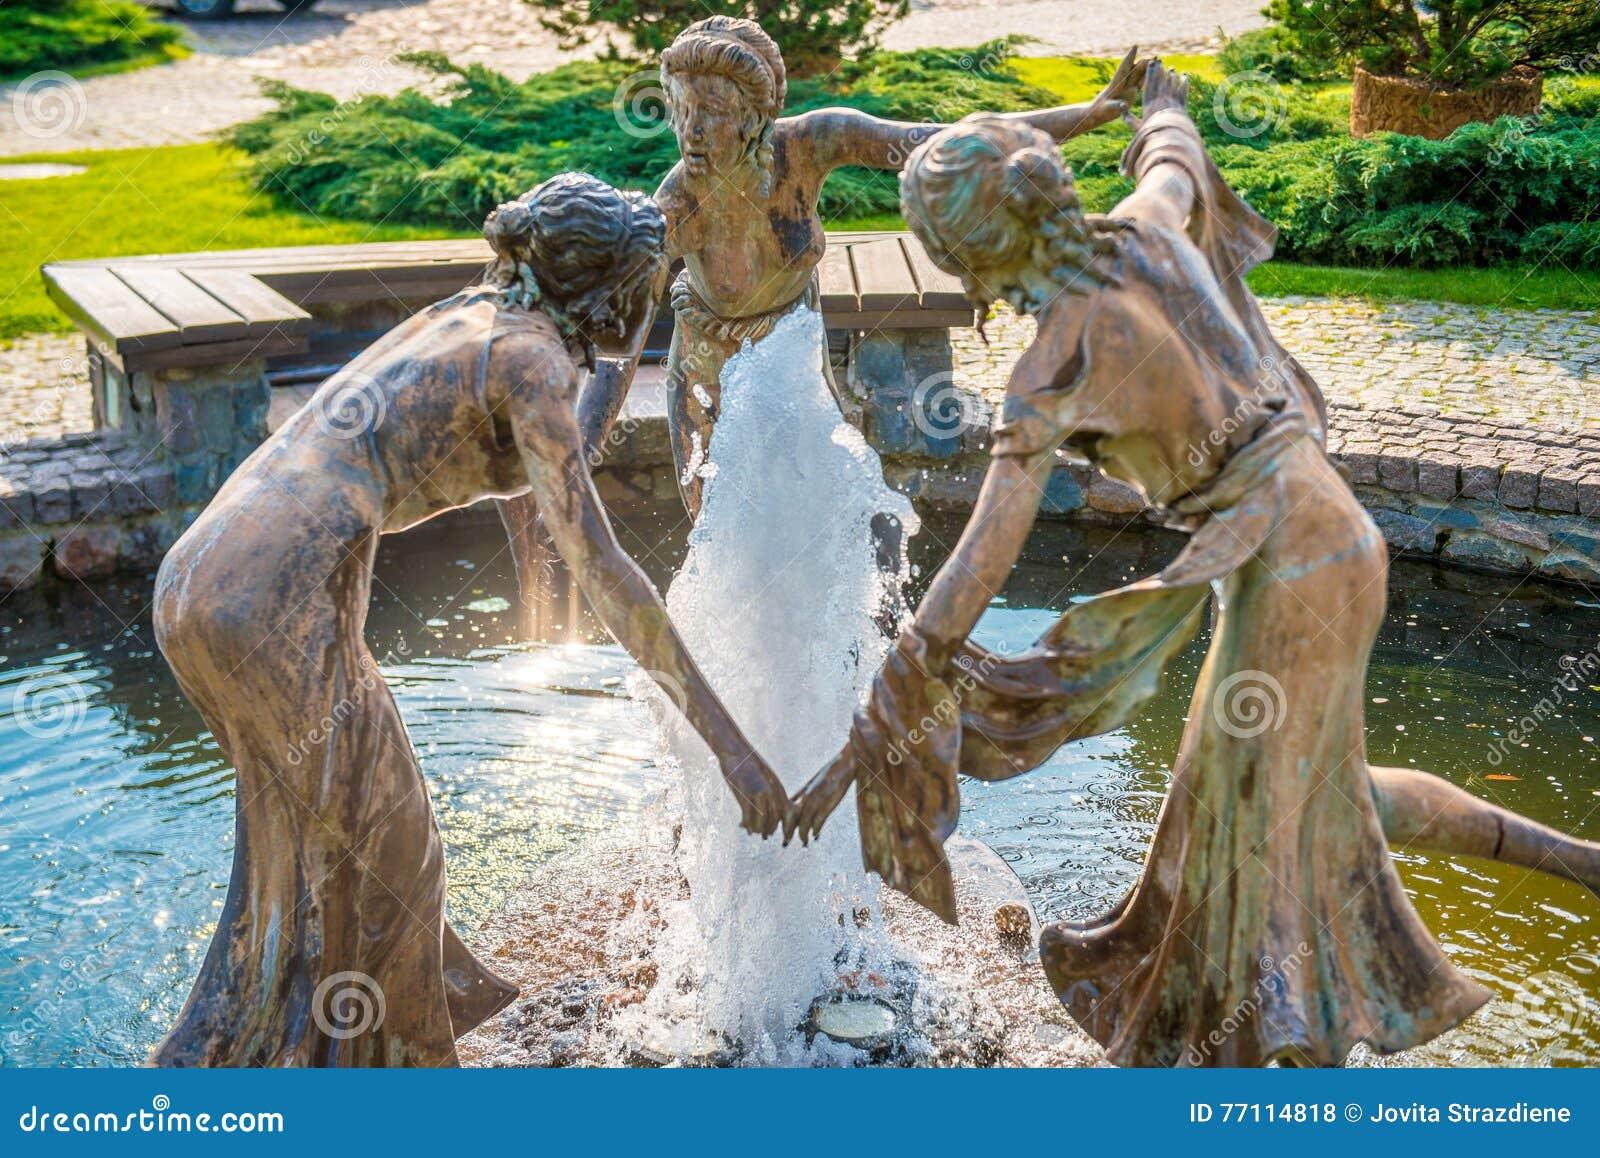 Sculptures in fountain